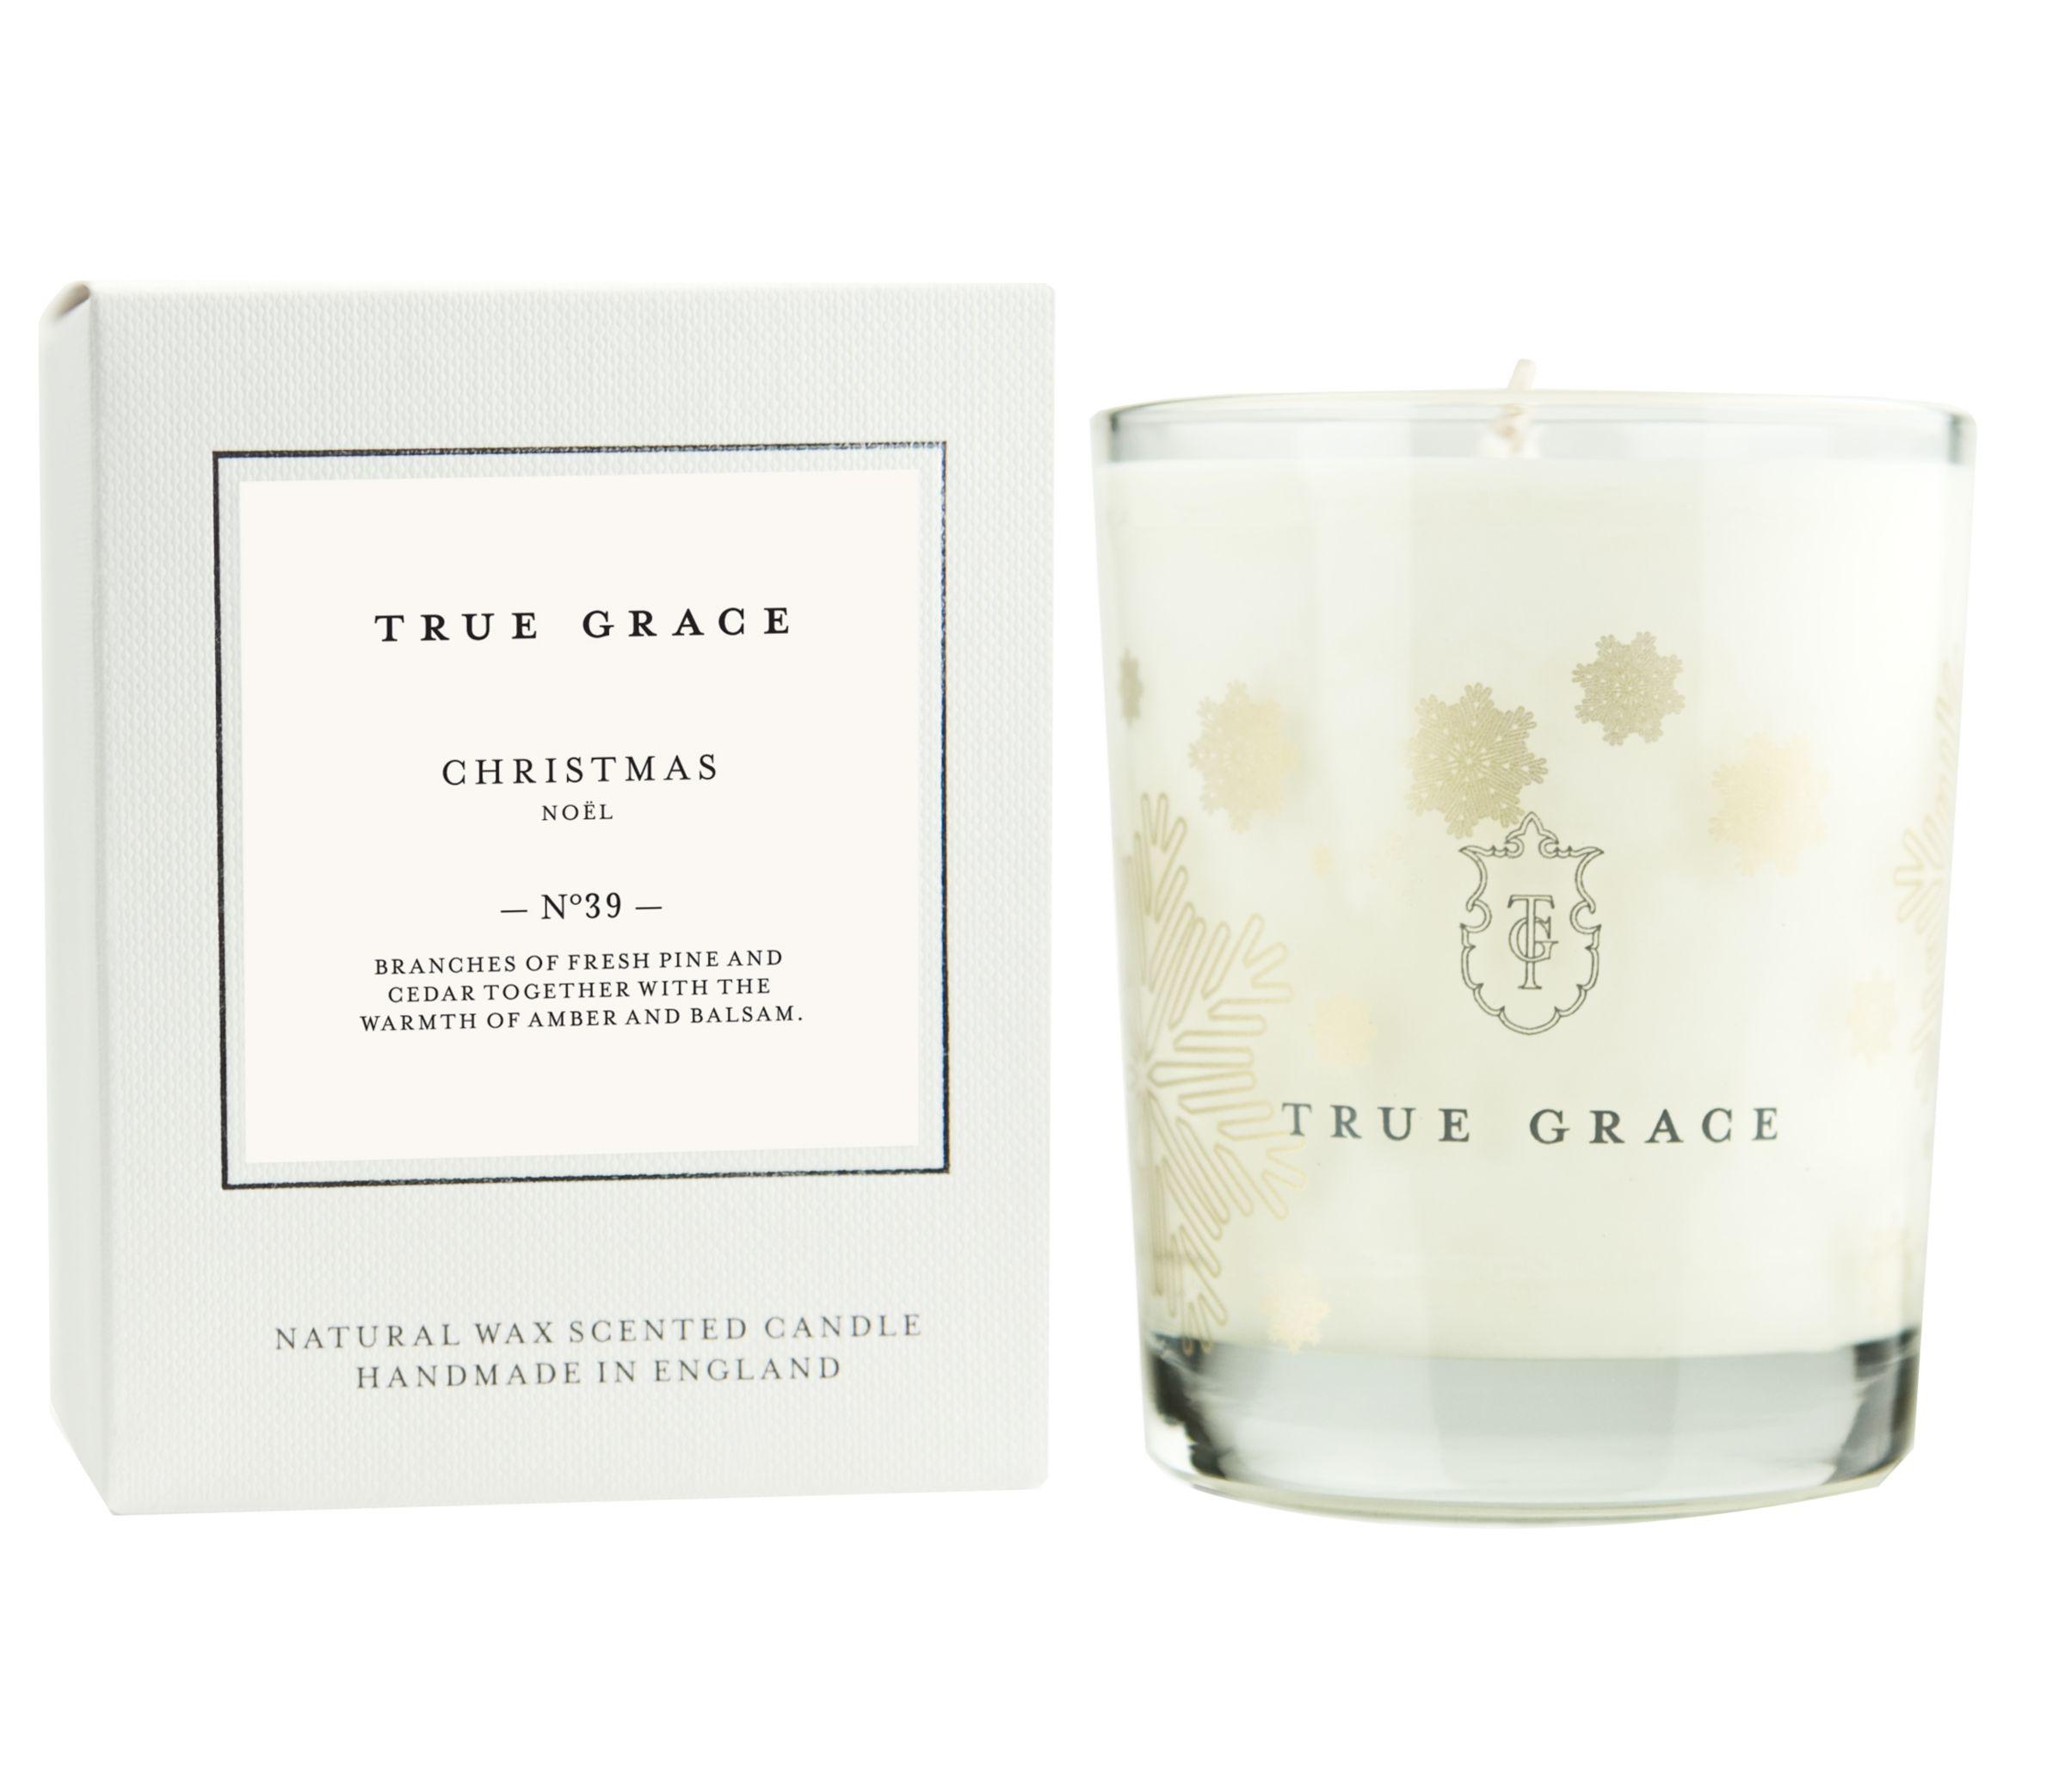 True Grace True Grace Christmas Noel No. 39 Scented Candle